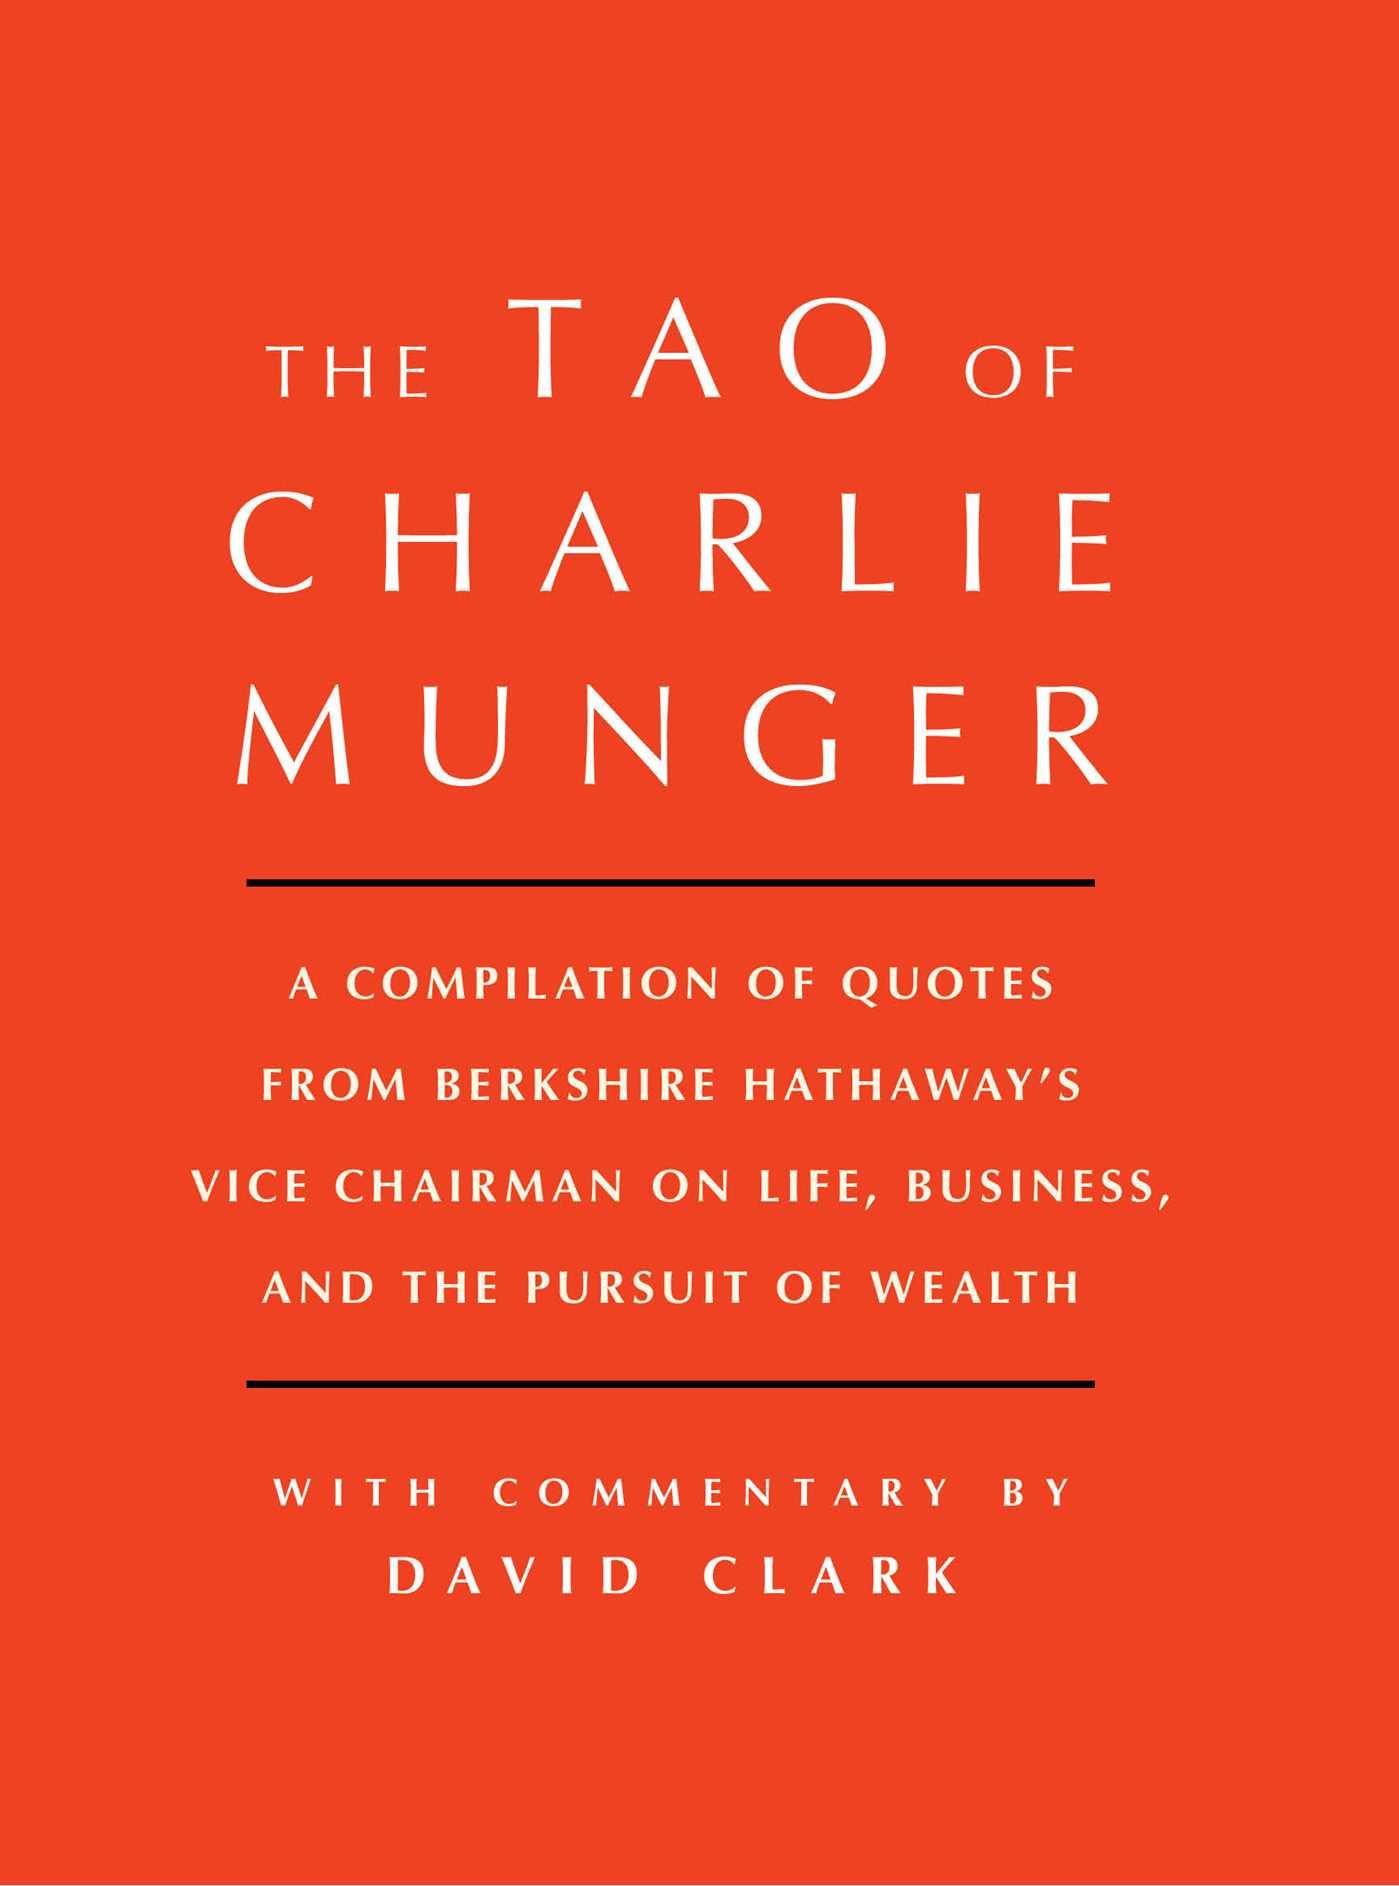 Tao of charlie munger 9781501153341 hr